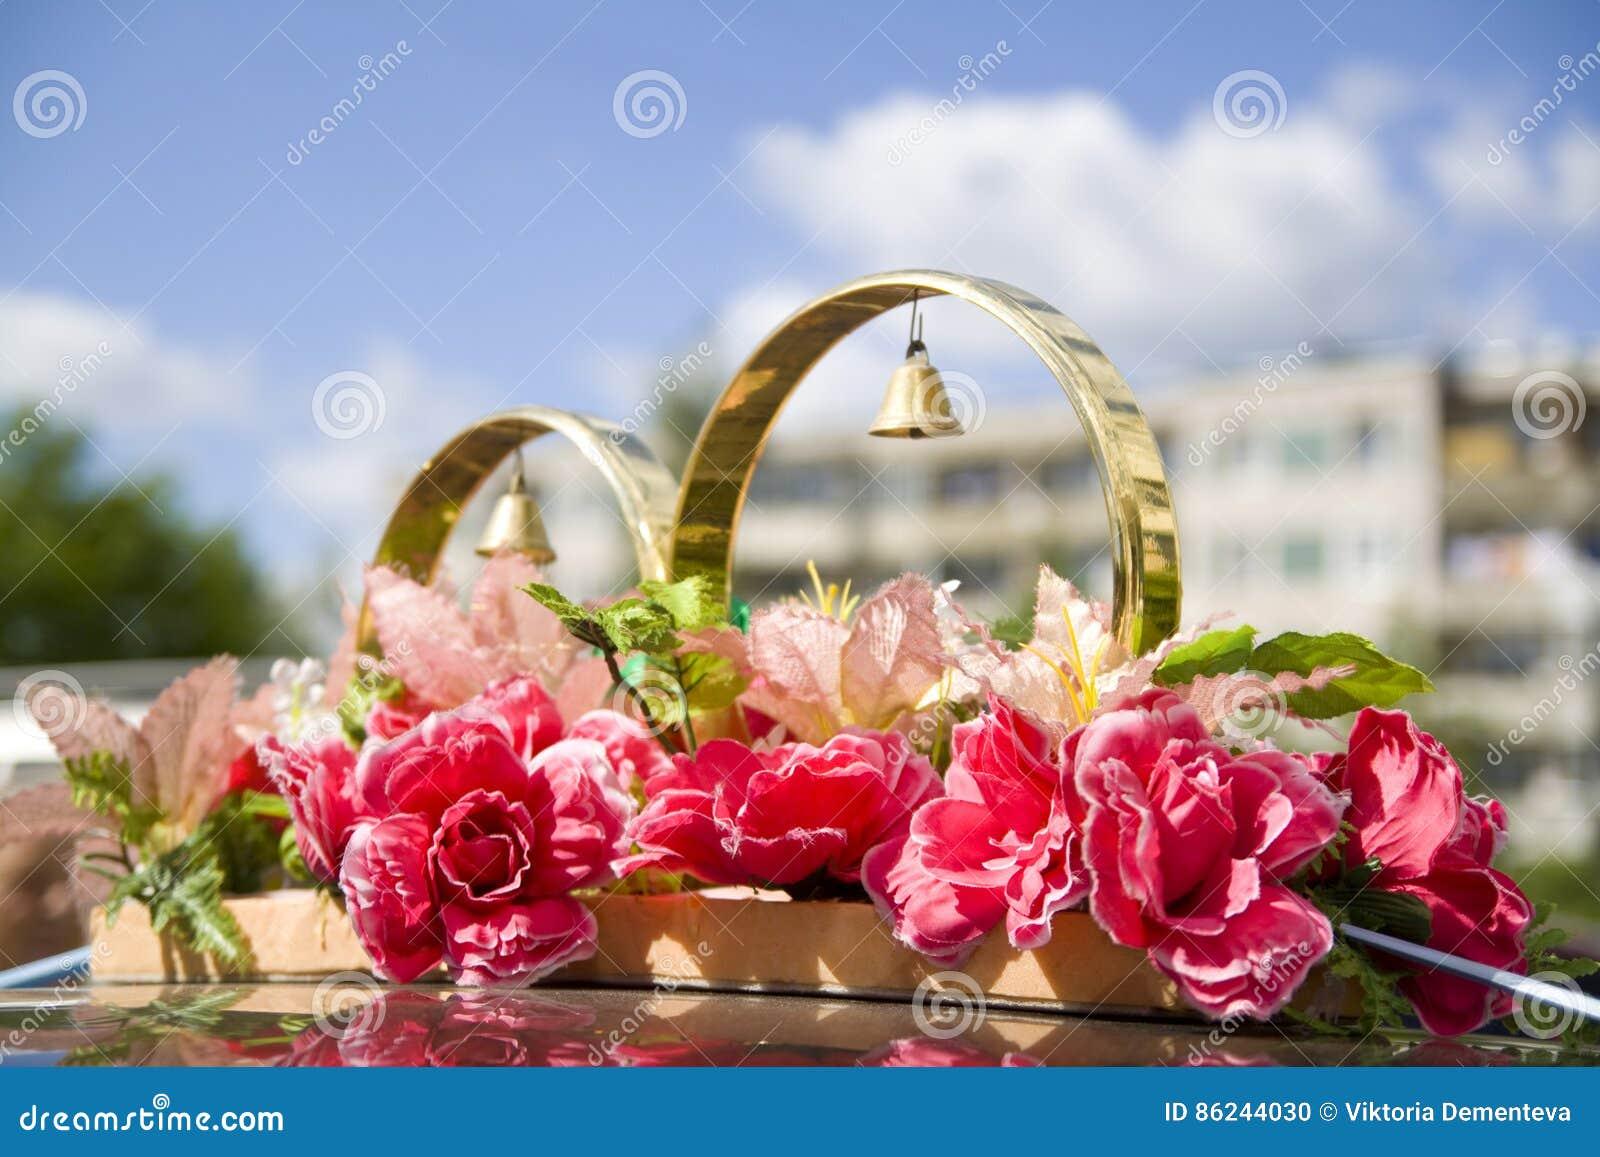 Wedding props wedding rings flowers wedding decoration items wedding props wedding rings flowers wedding decoration items rings decorations on the car junglespirit Images